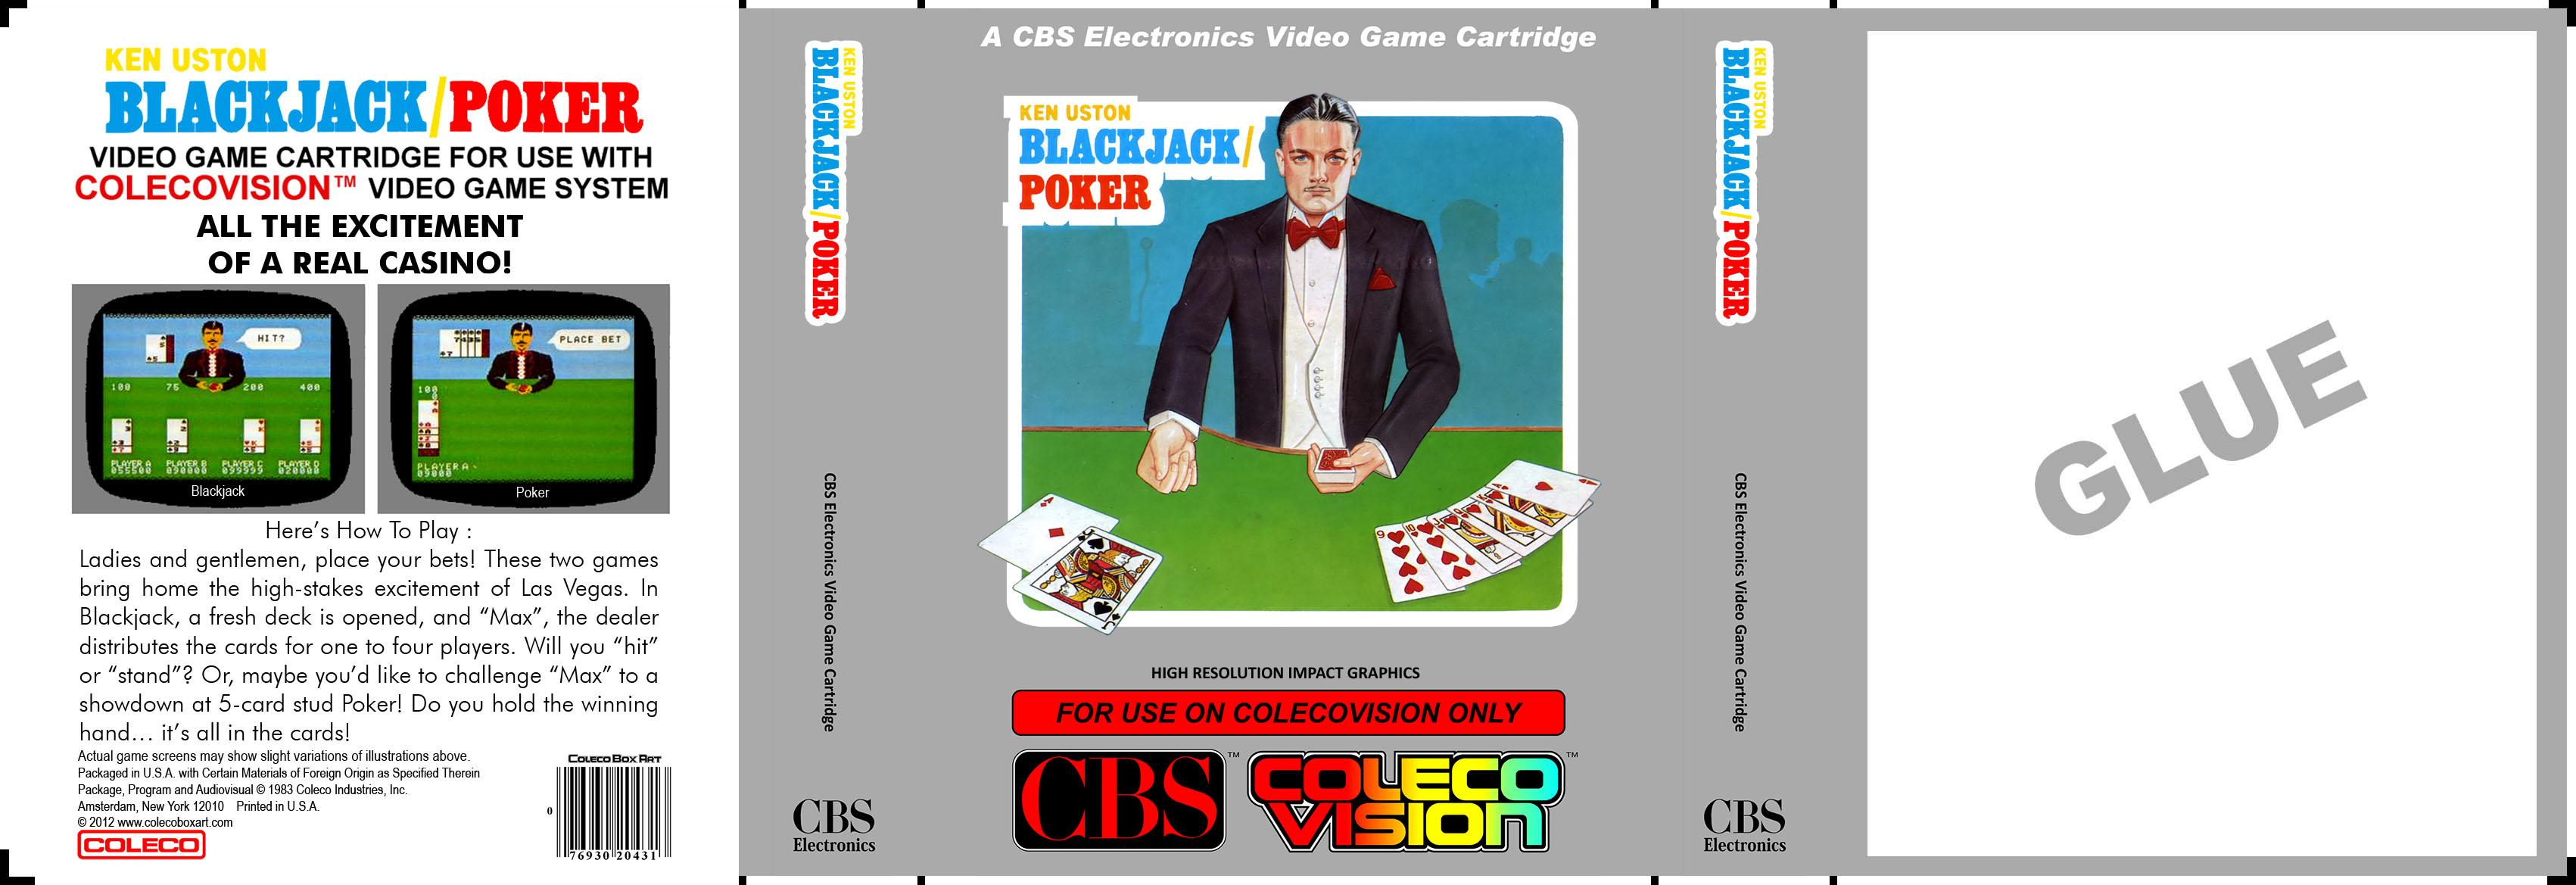 Win king poker cards